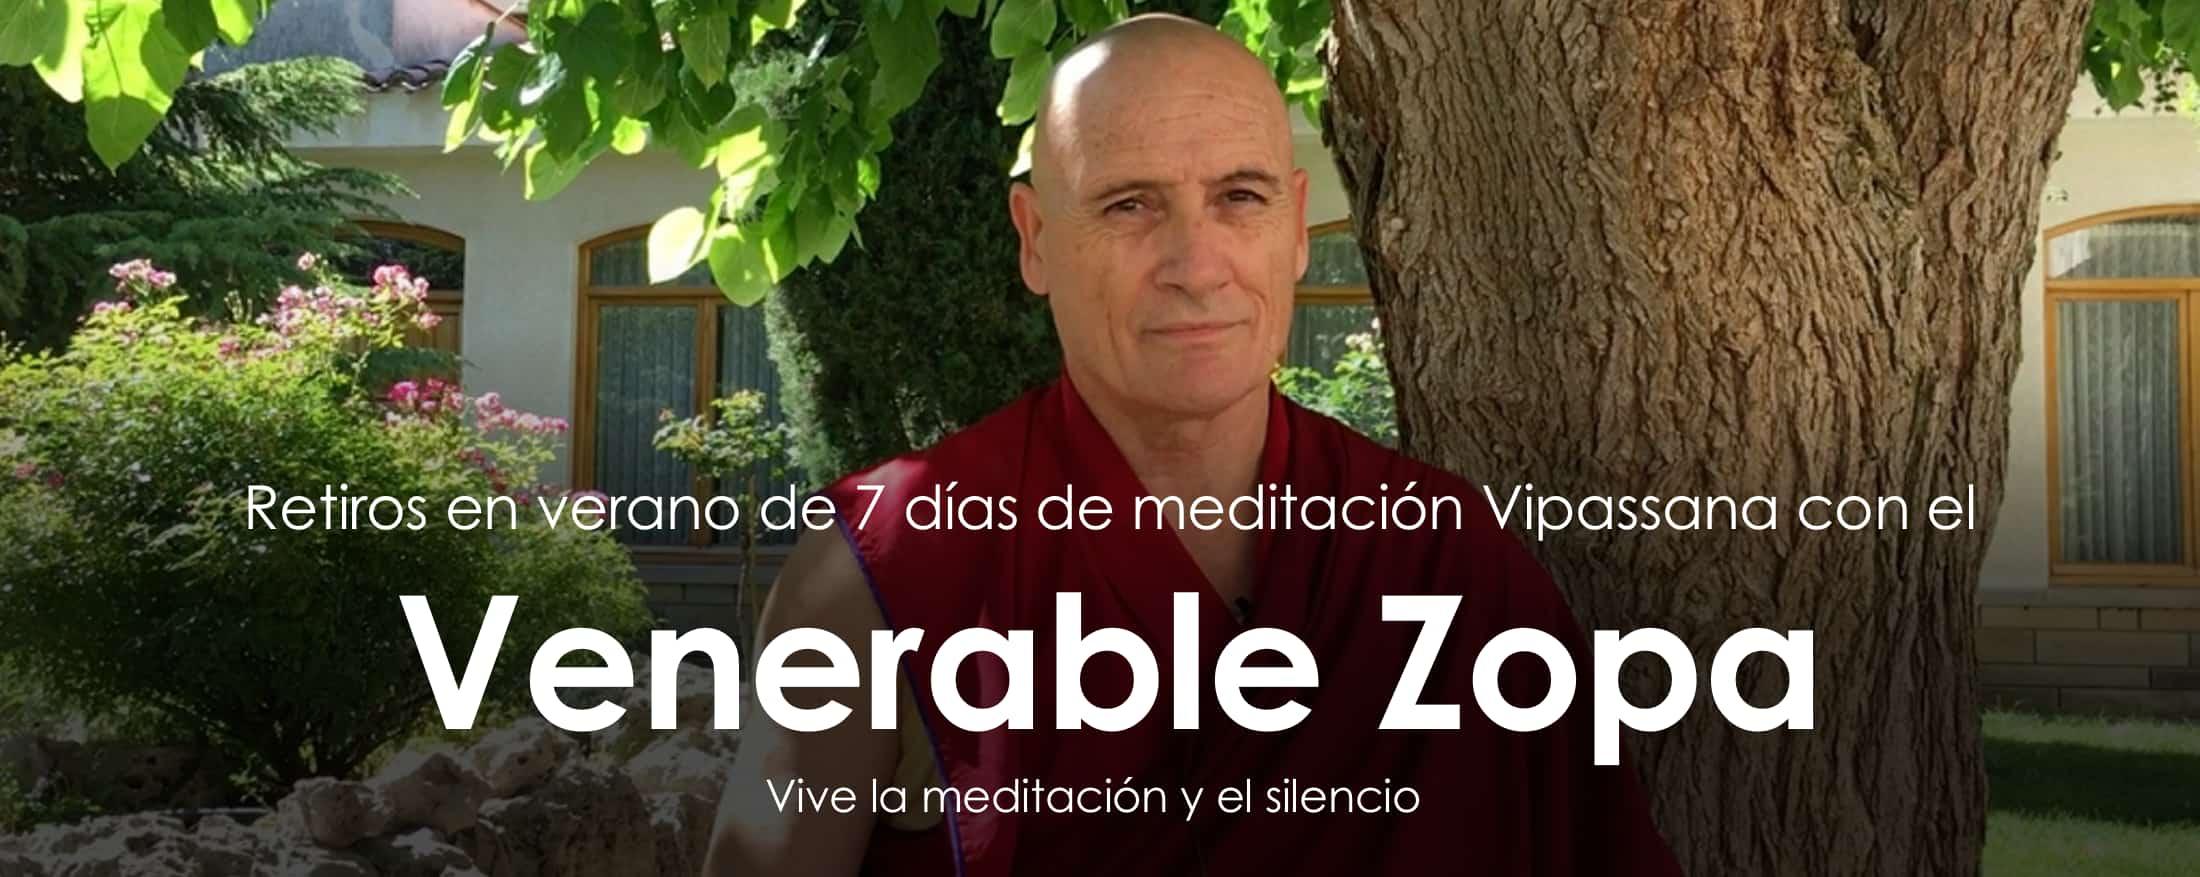 Retiros de meditación con Zopa